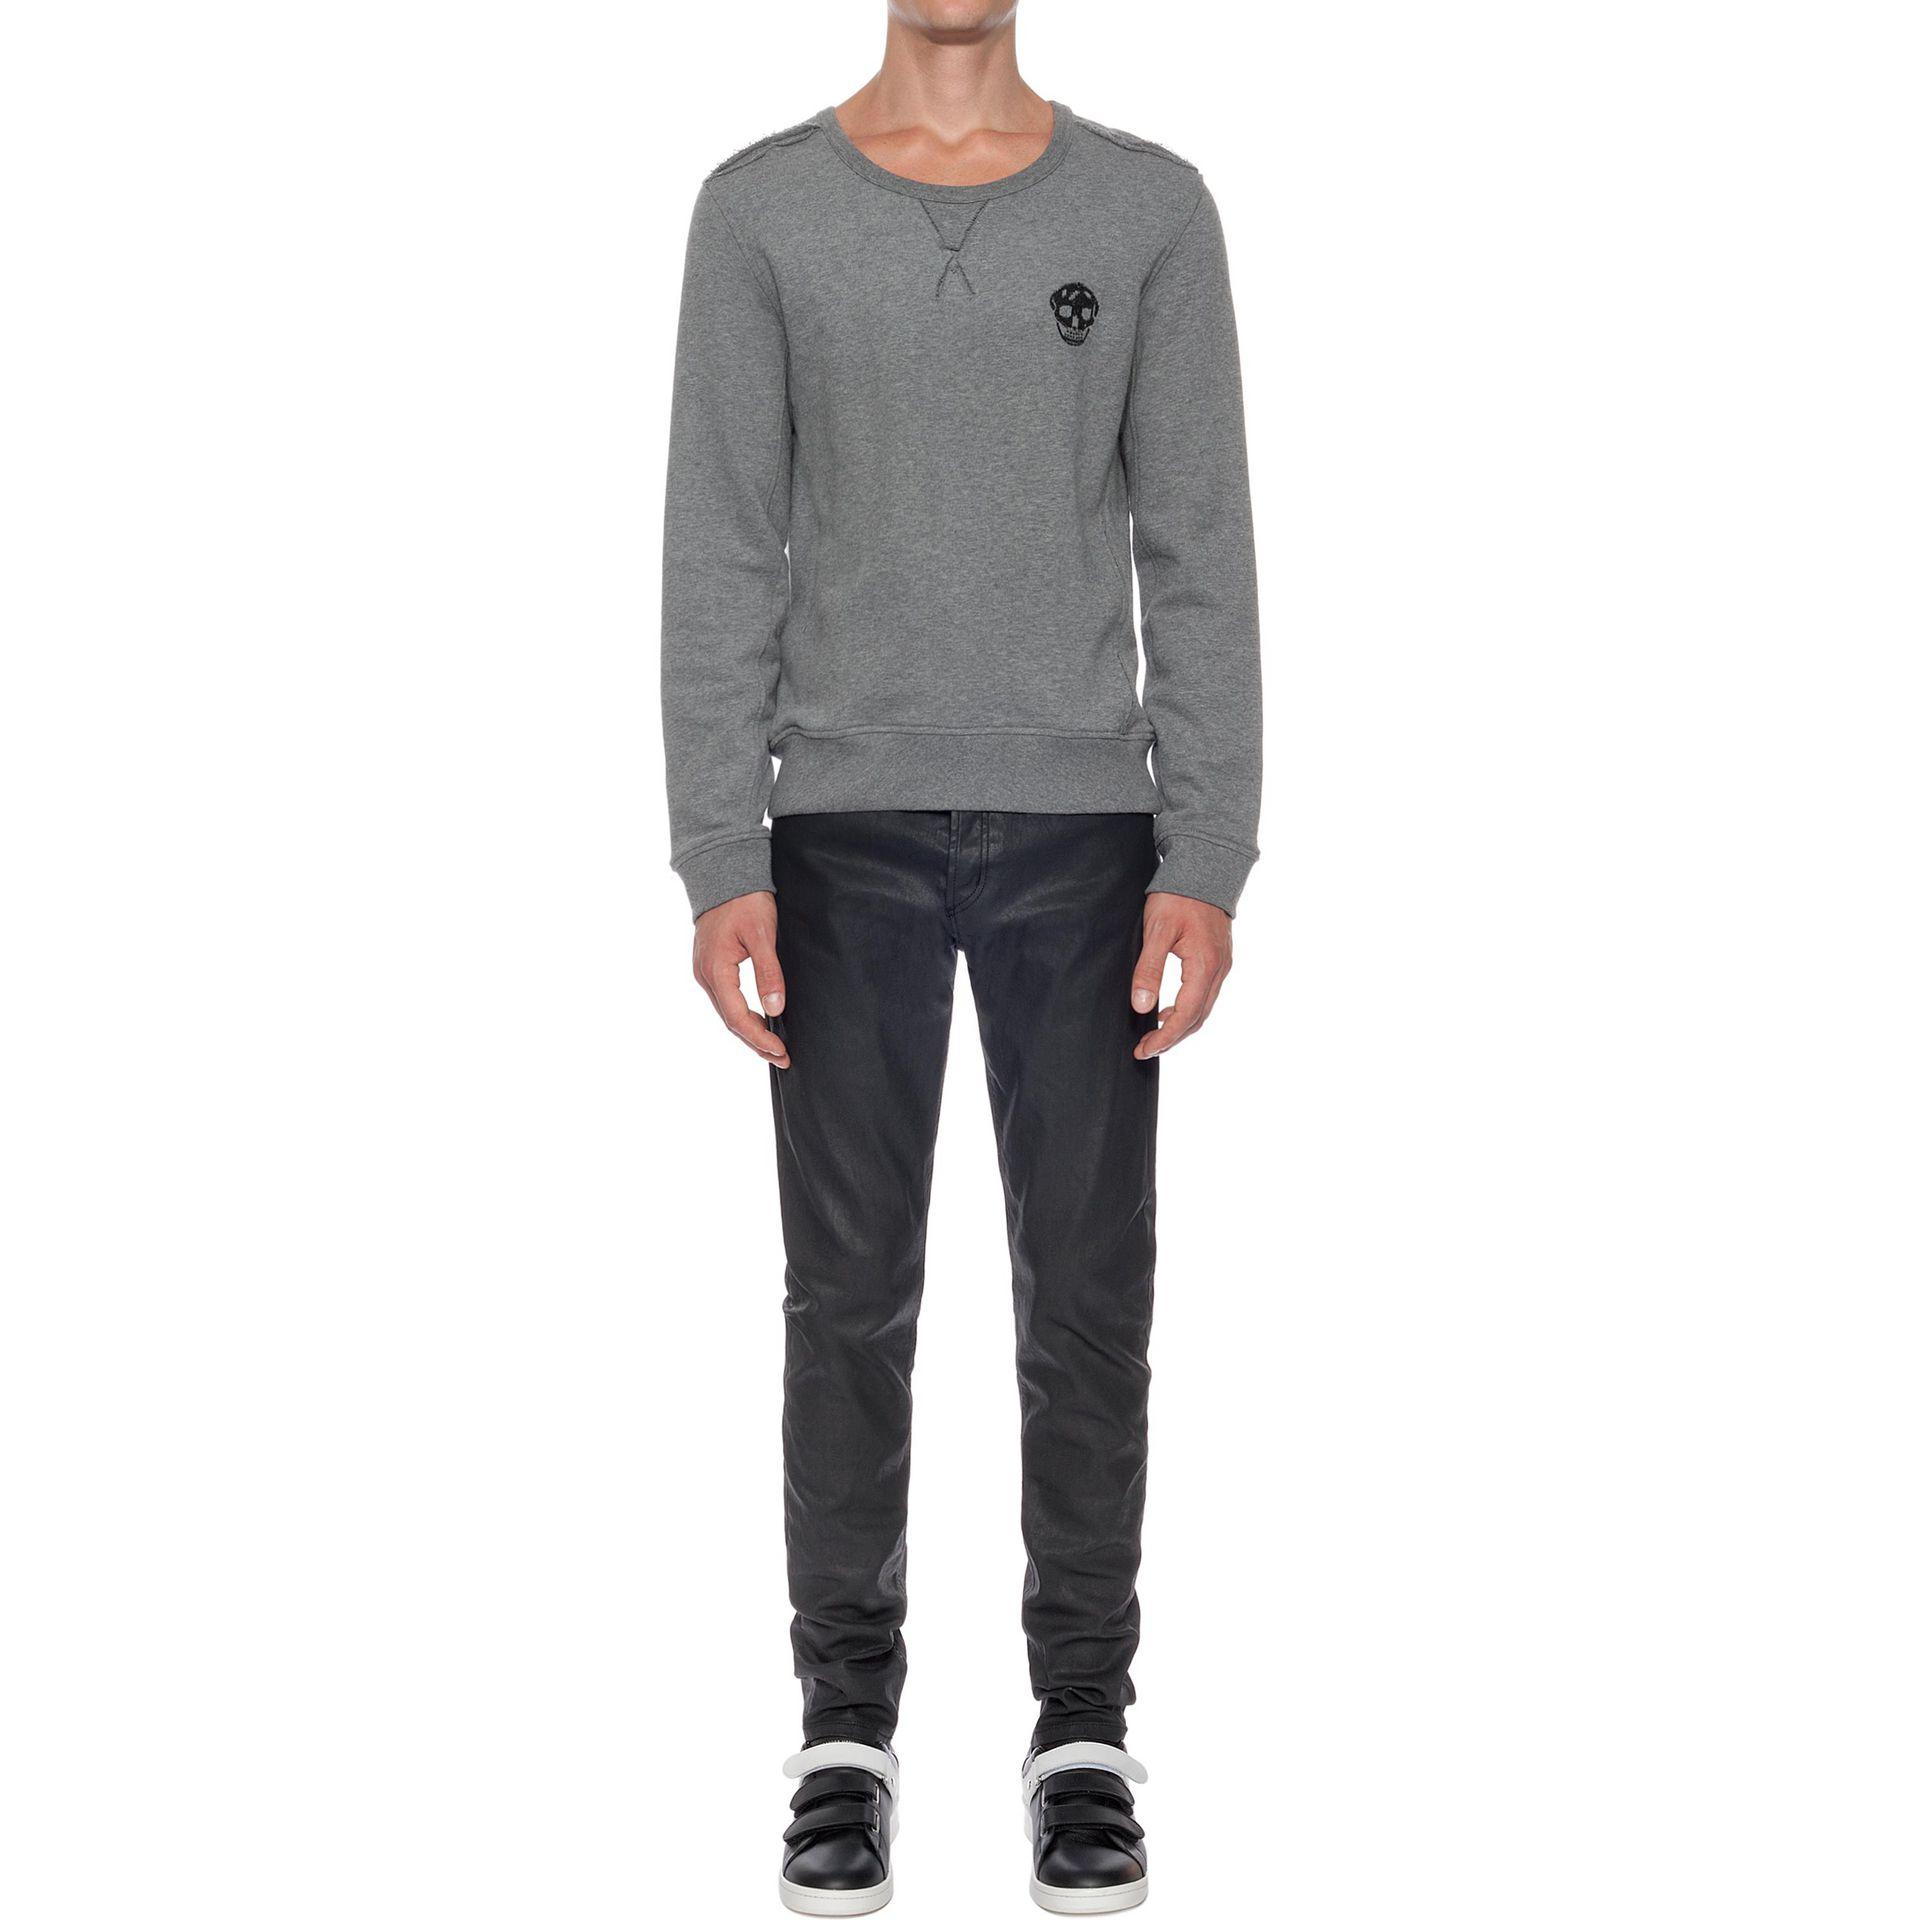 alexander mcqueen embroidered skull sweatshirt in gray for men grey lyst. Black Bedroom Furniture Sets. Home Design Ideas